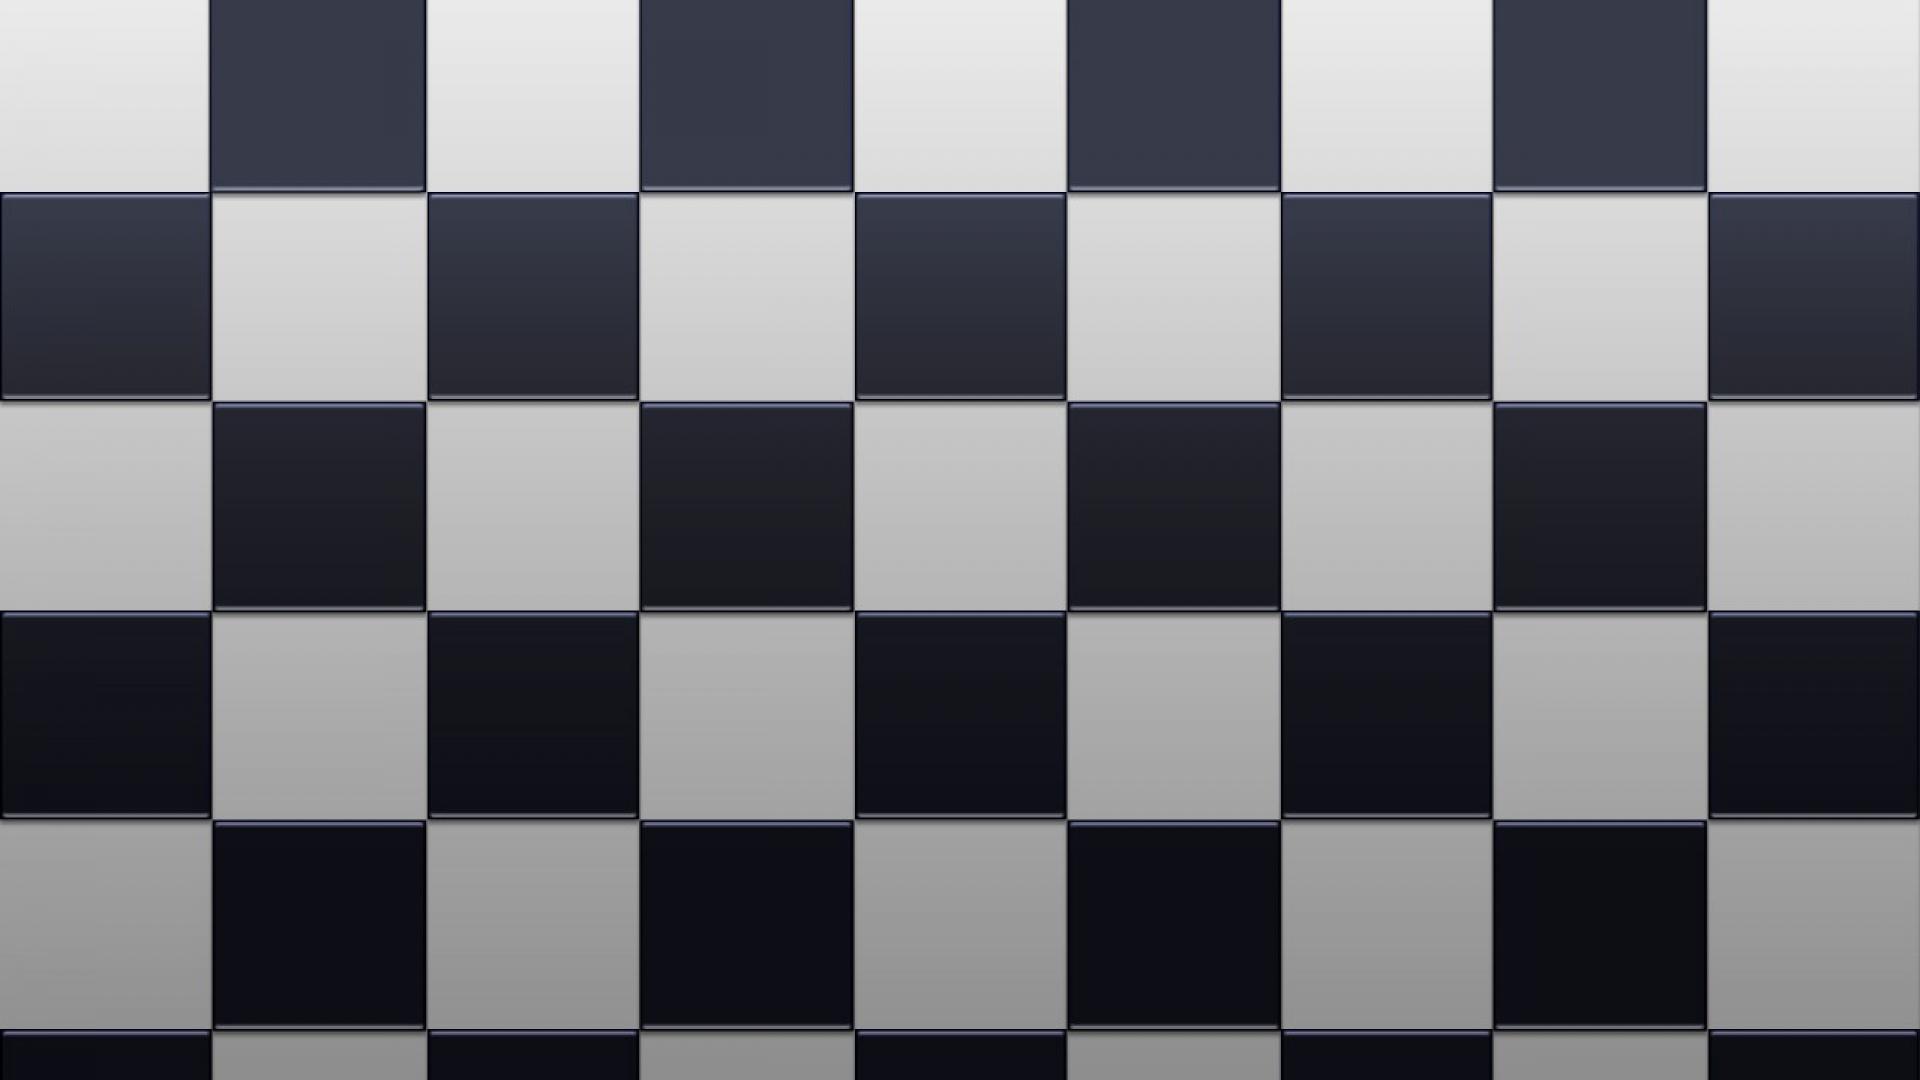 Chess Board Wallpaper 964176